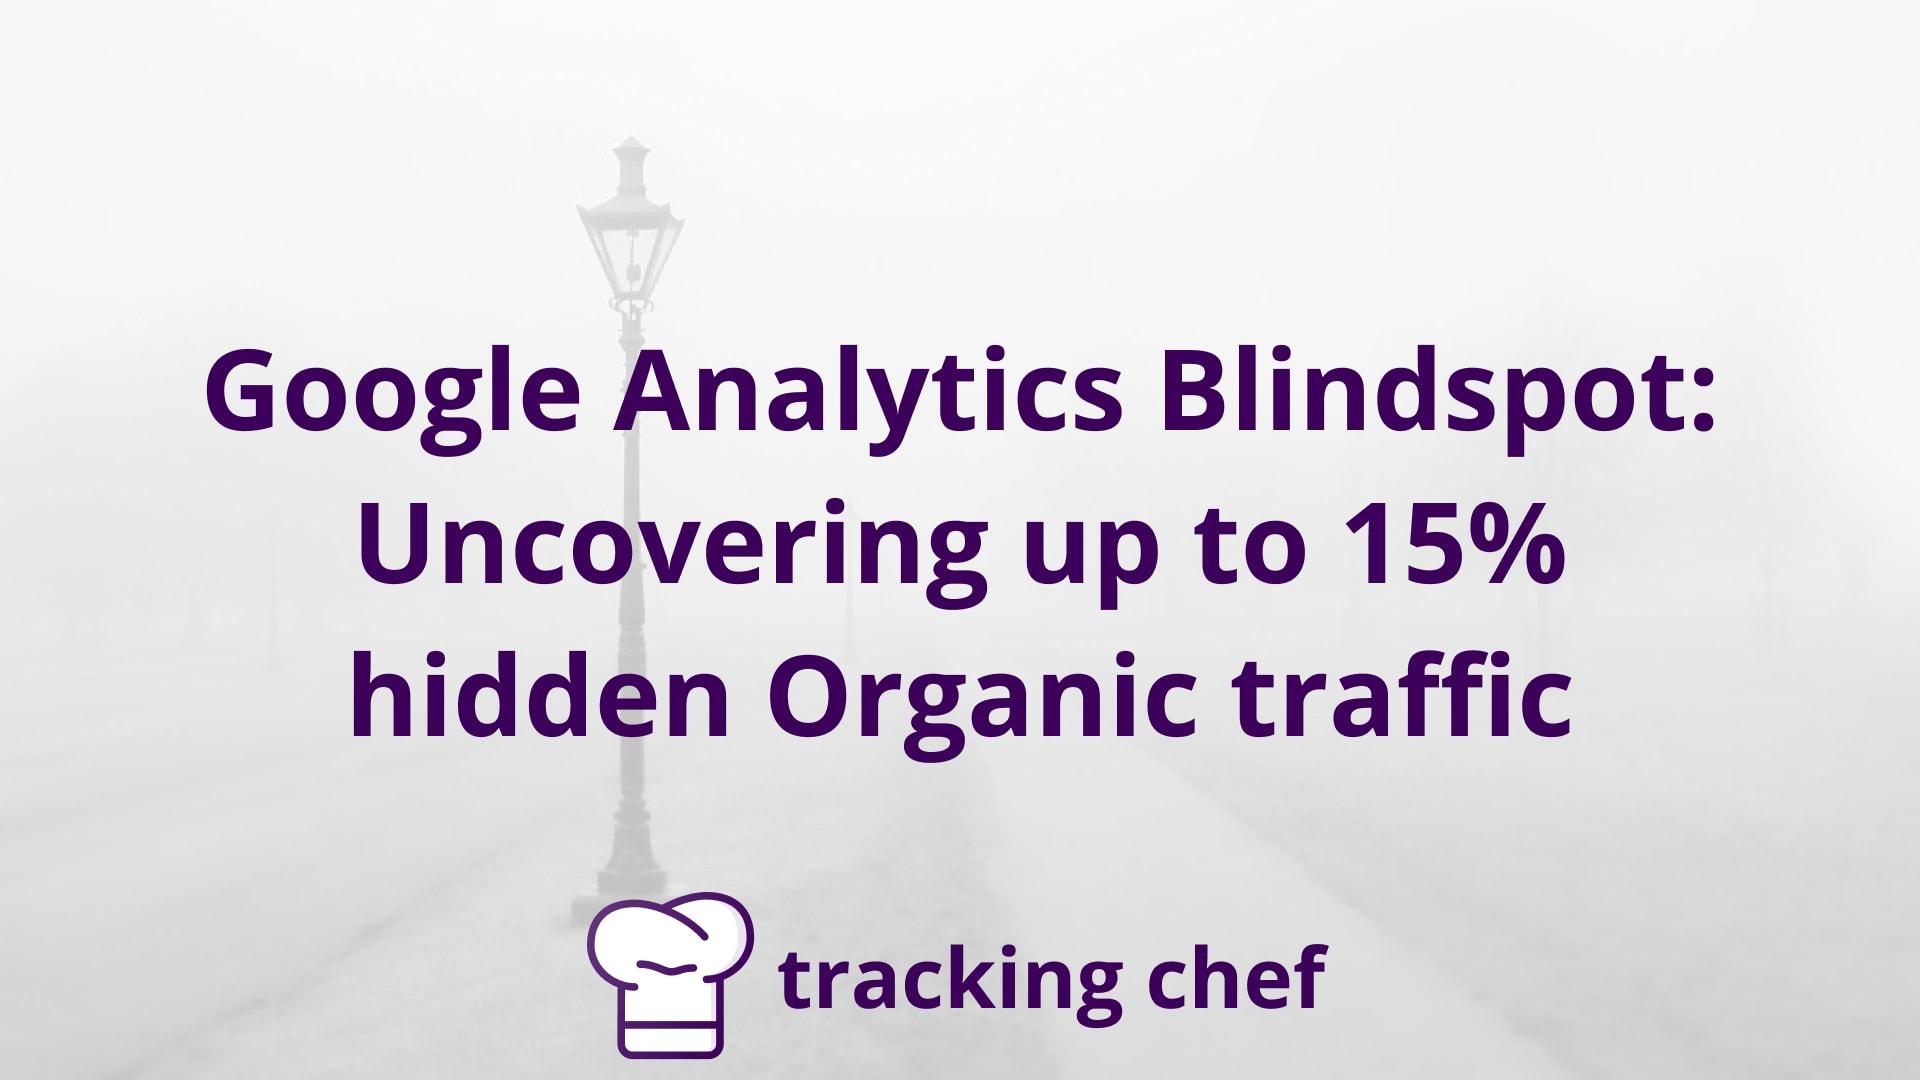 Google Analytics Blindspot: Uncovering up to 15% hidden Organic traffic